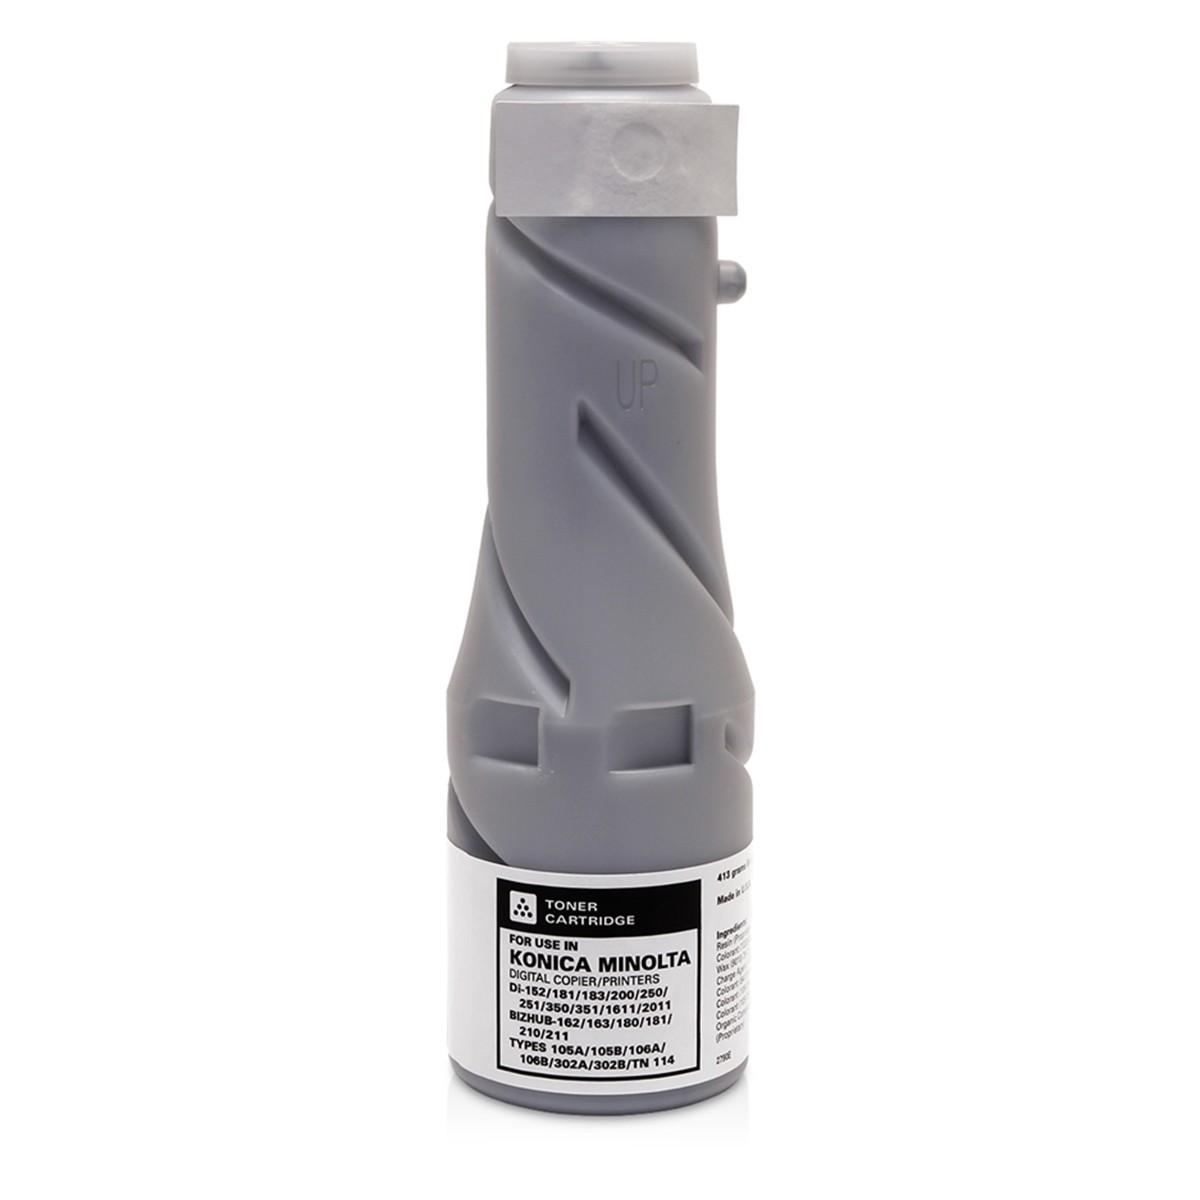 Toner Compatível p/ Minolta DI 152 181 183 200 250 (Kit c/2)